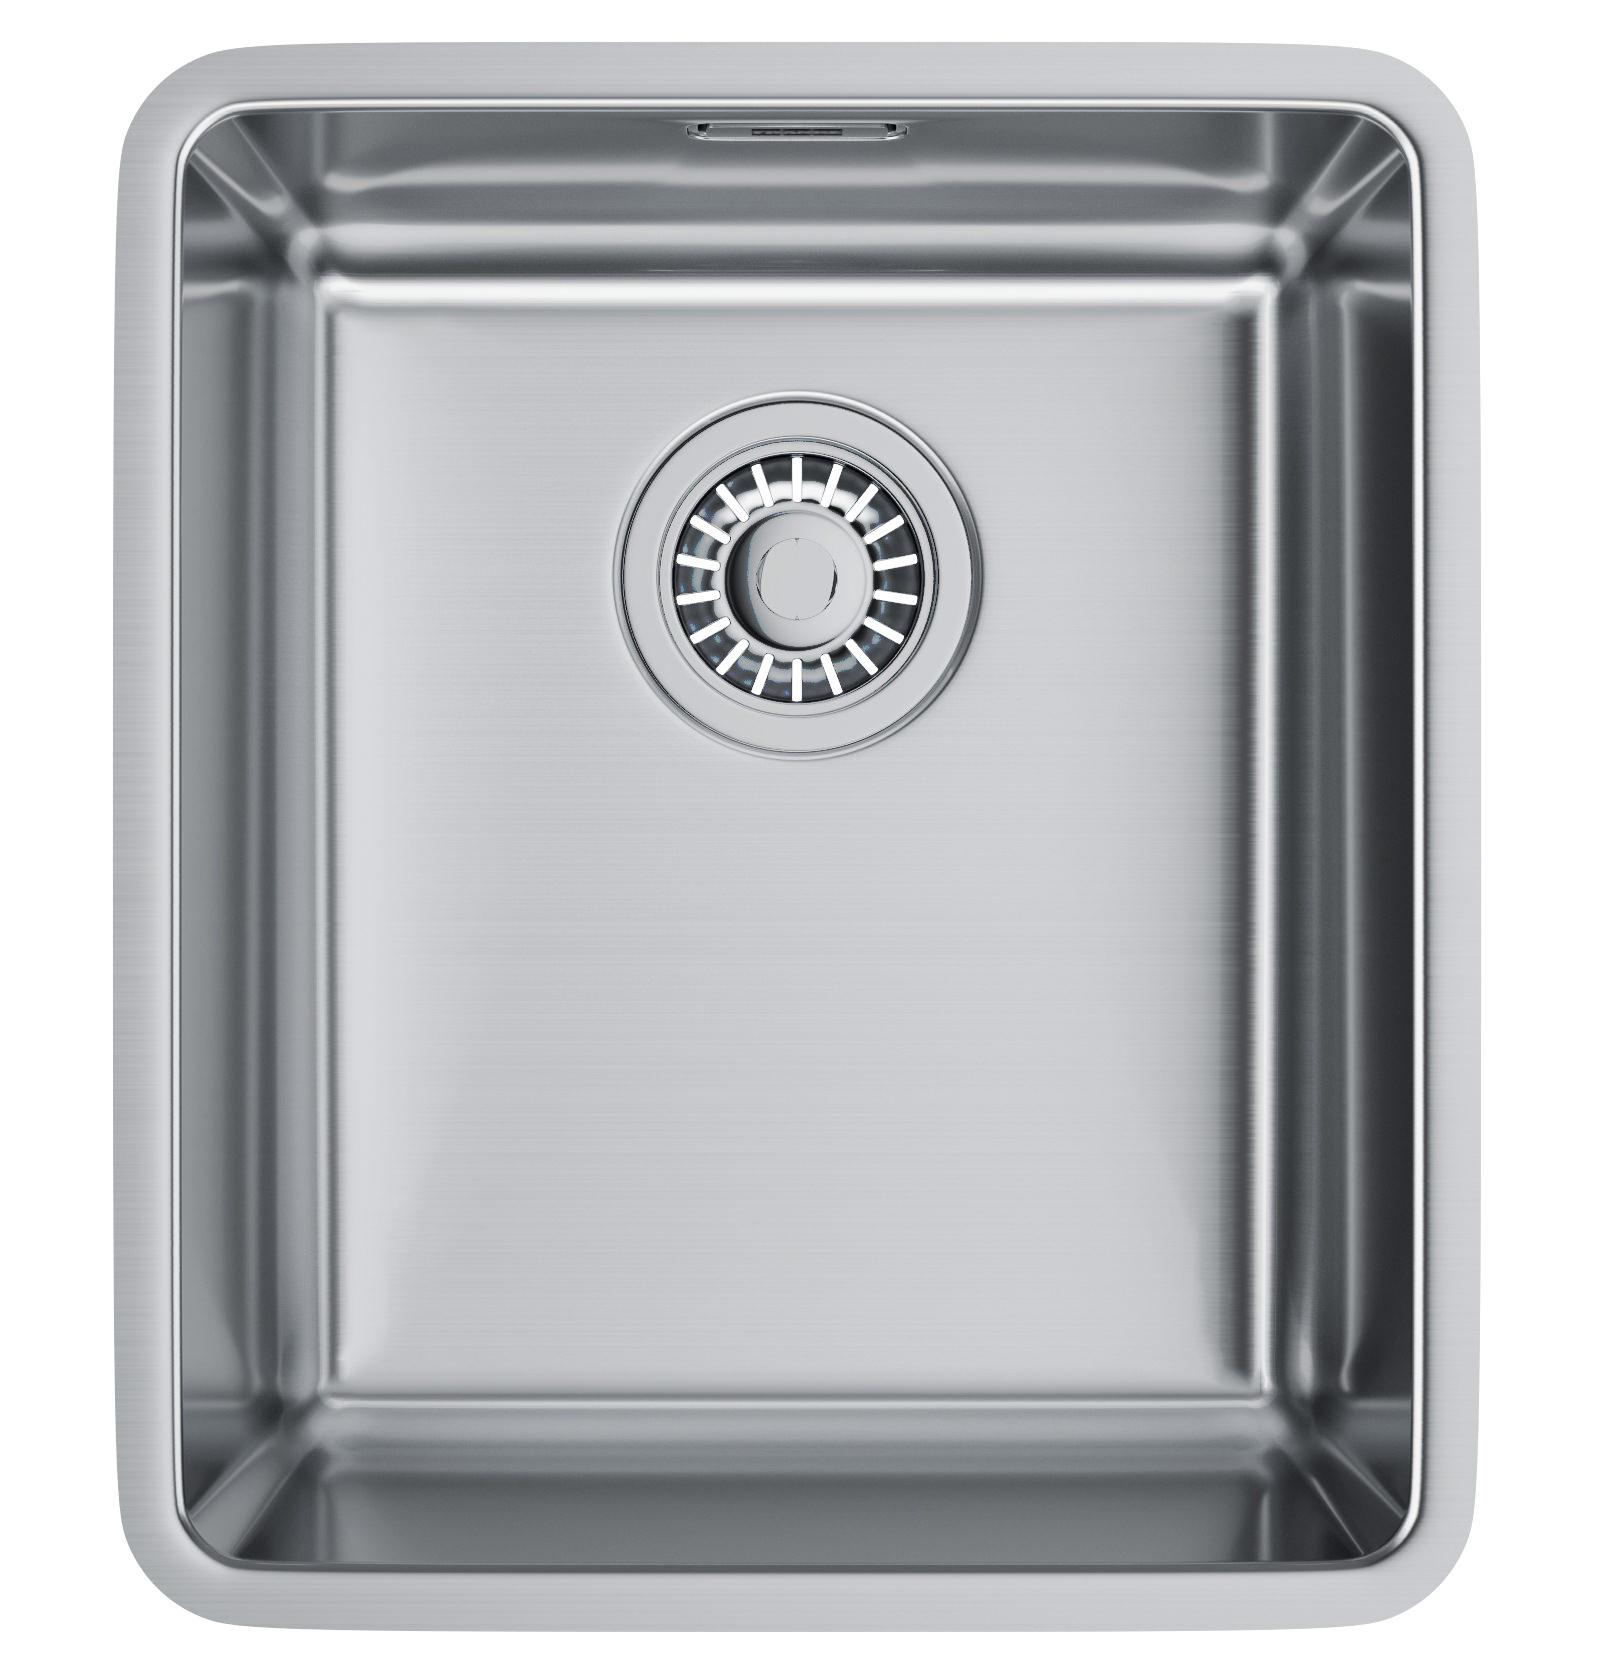 Franke Kubus KBX 110 34 Stainless Steel Undermount Kitchen